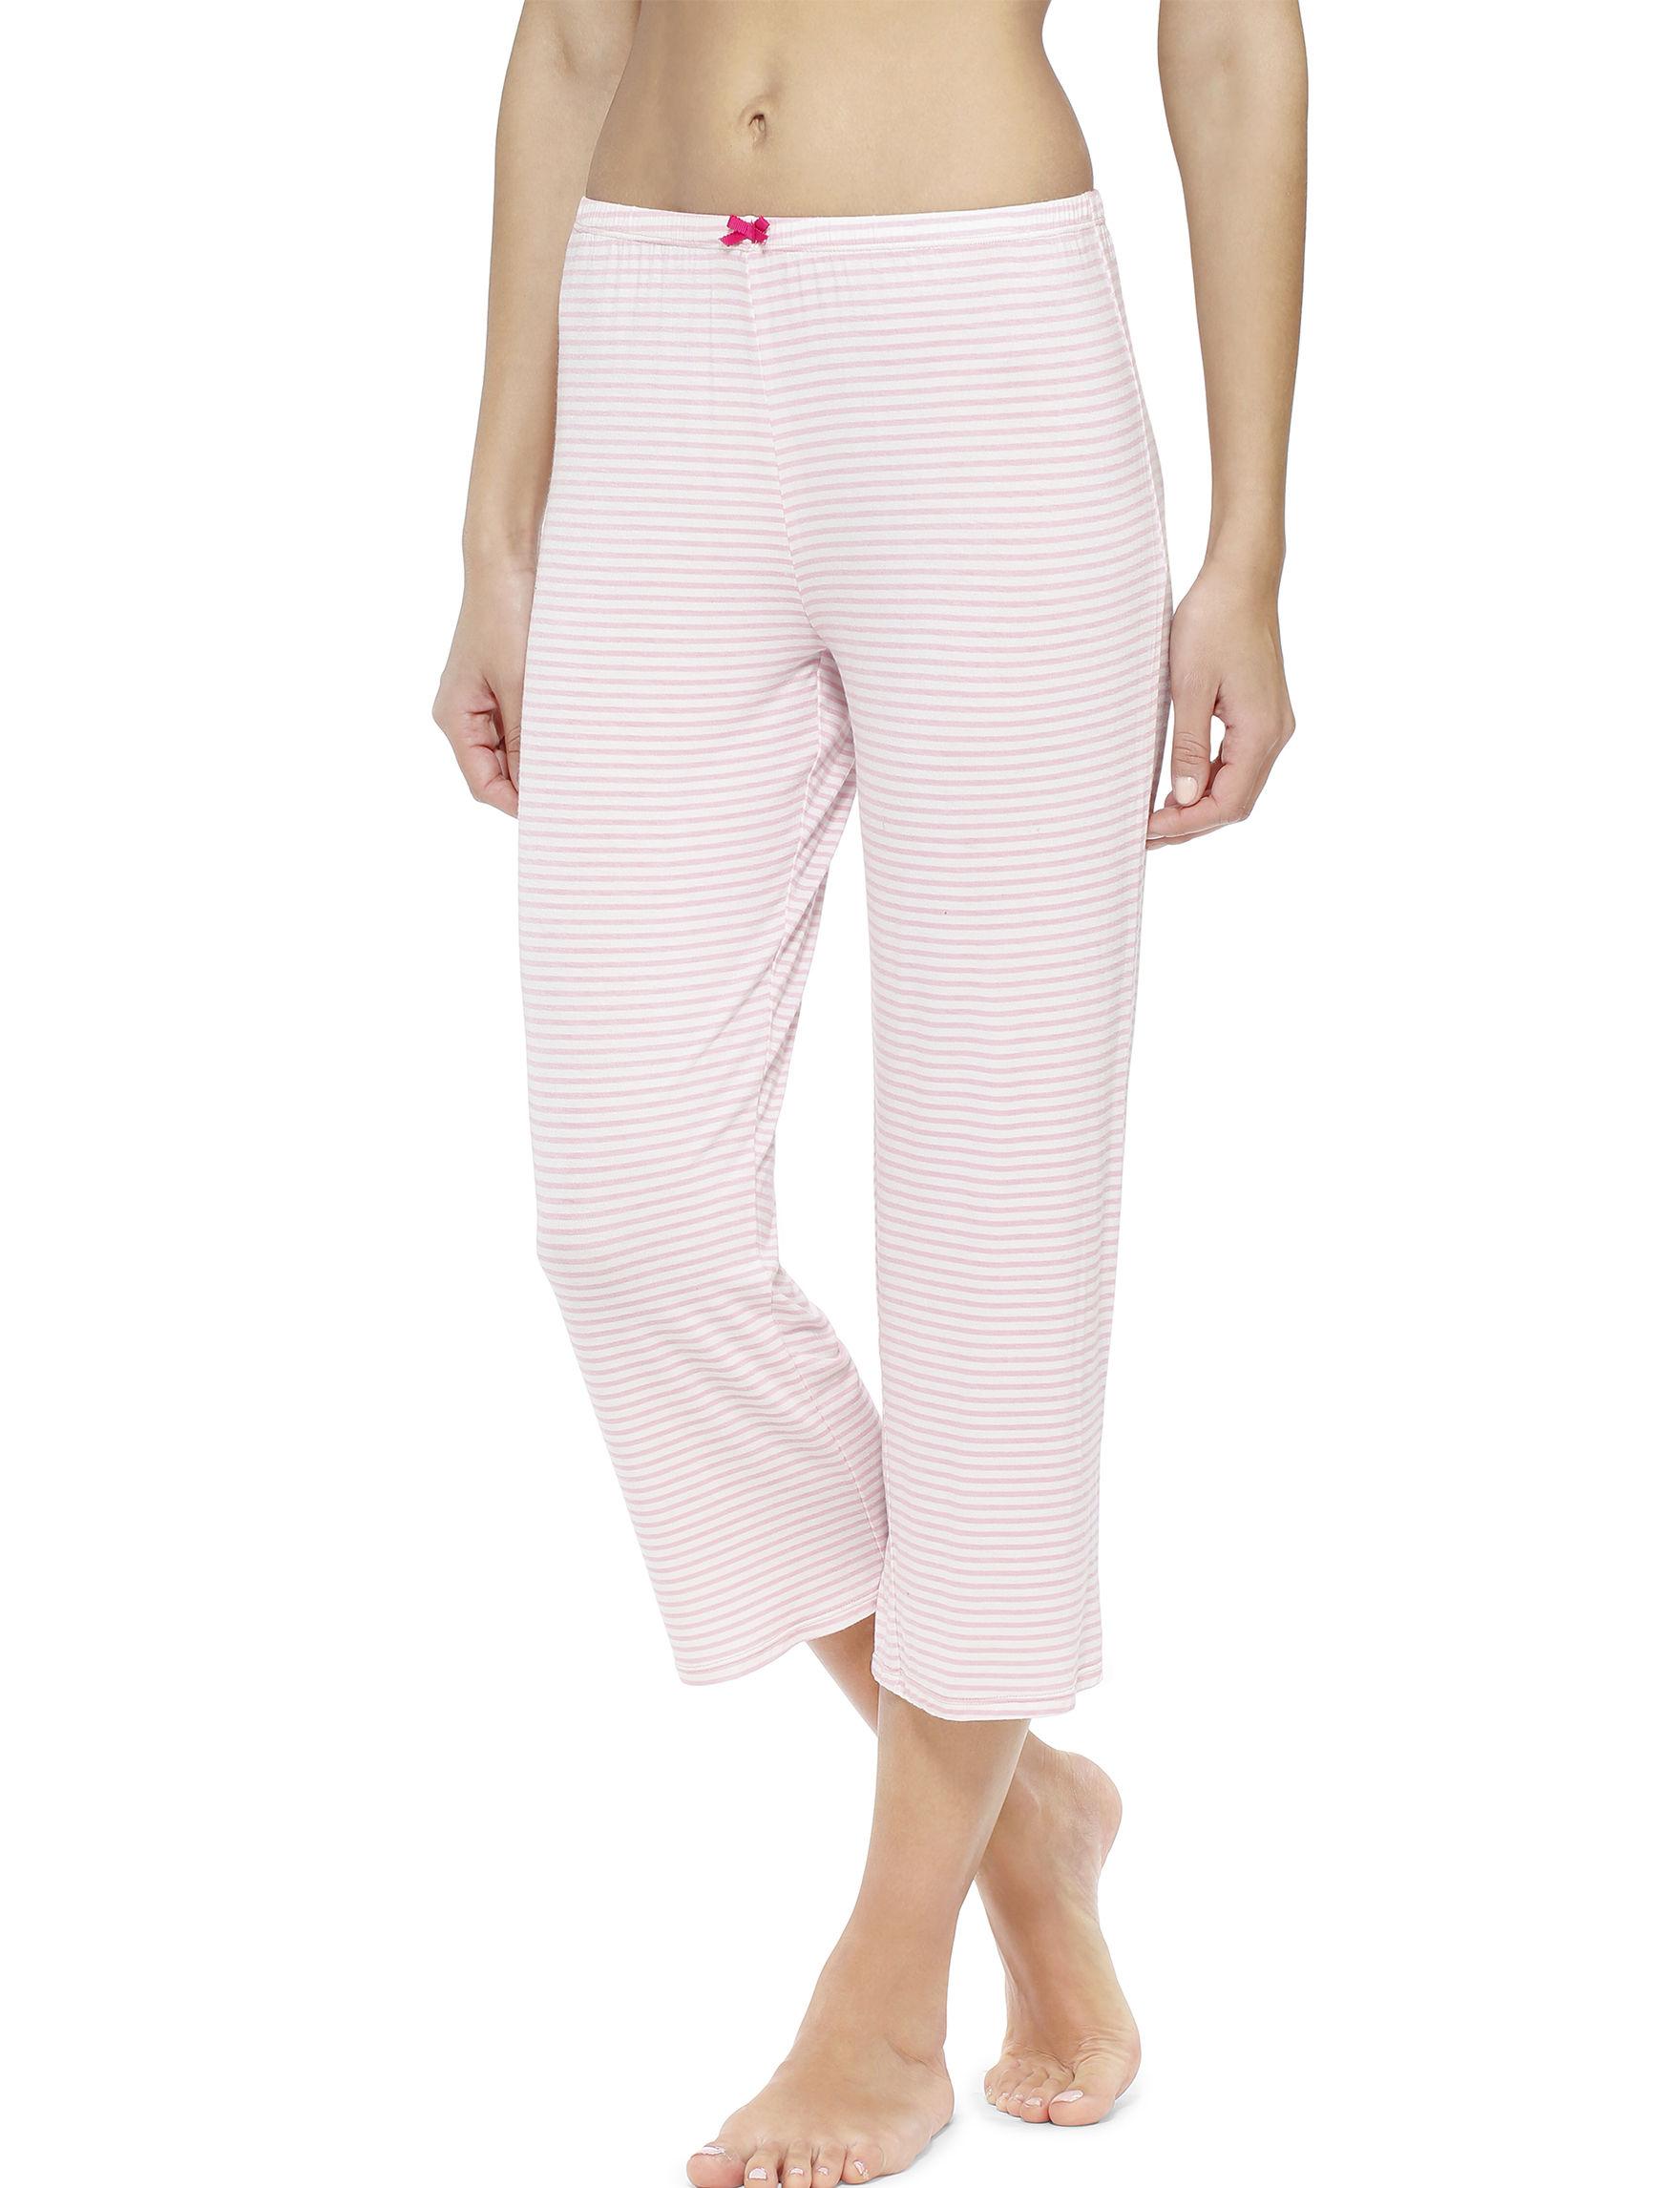 Ellen Tracy Pink / White Pajama Bottoms